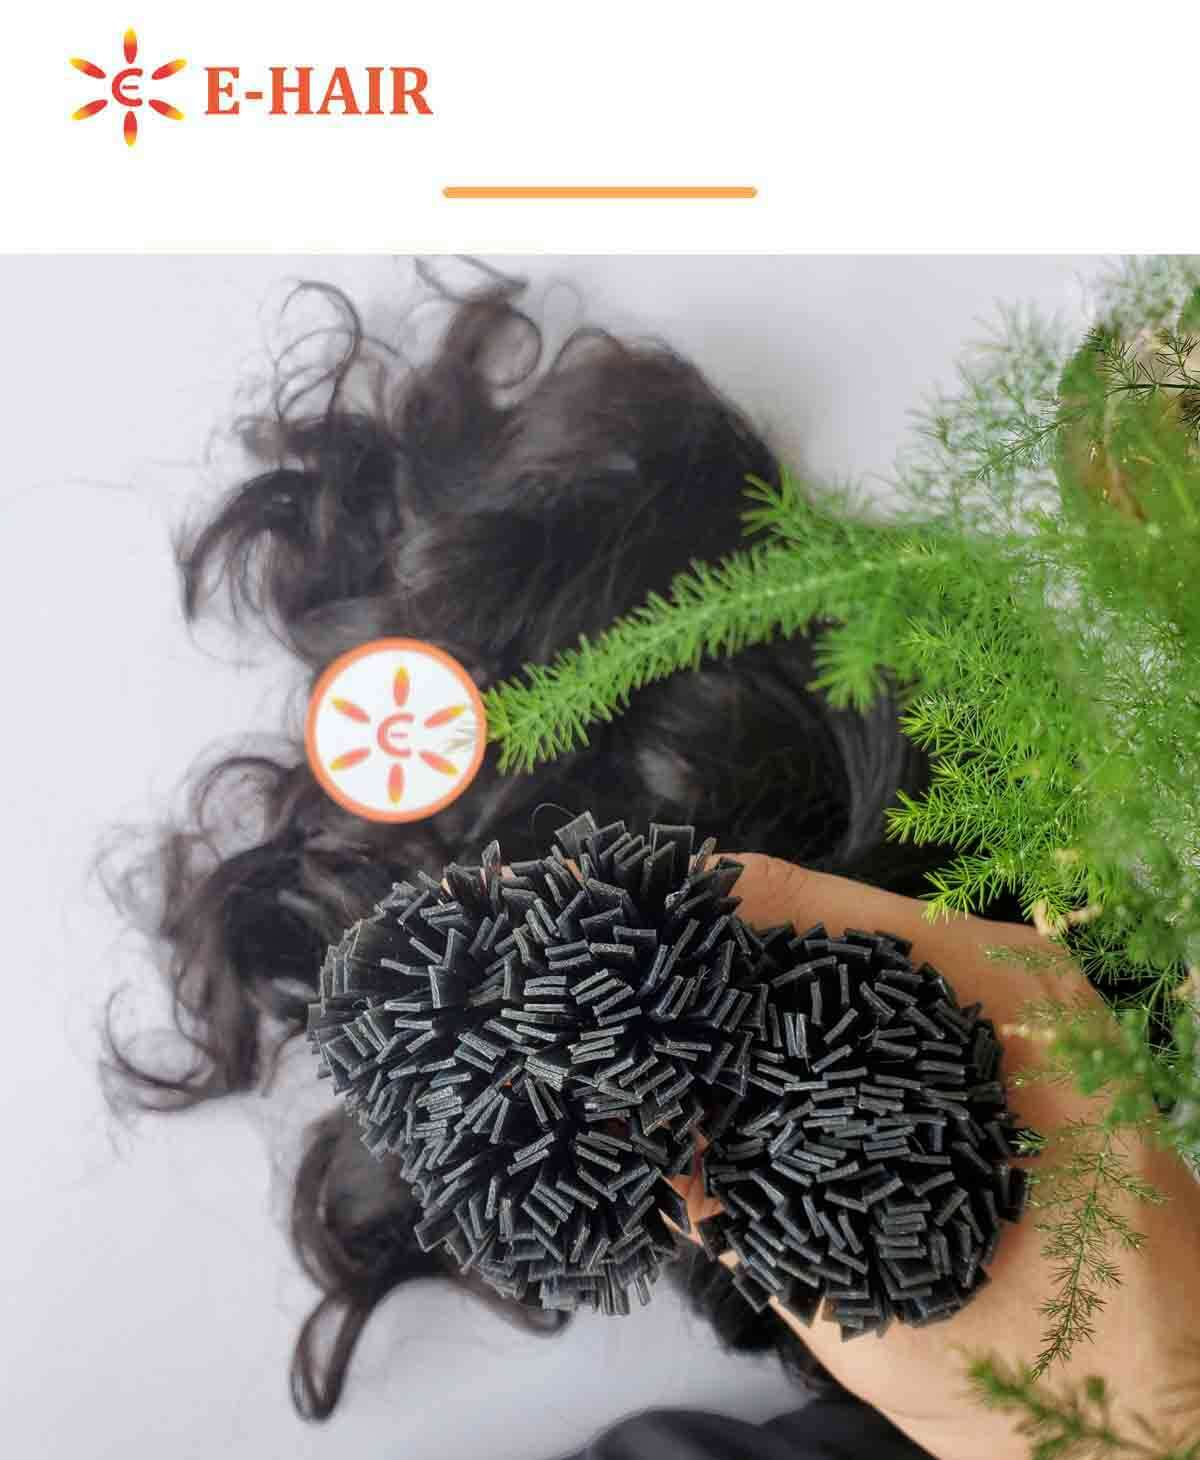 ehairvietnam, hair, hair extensions,wigs, vietnam hair, hair extensions,natural hair, hair extensions,export hair